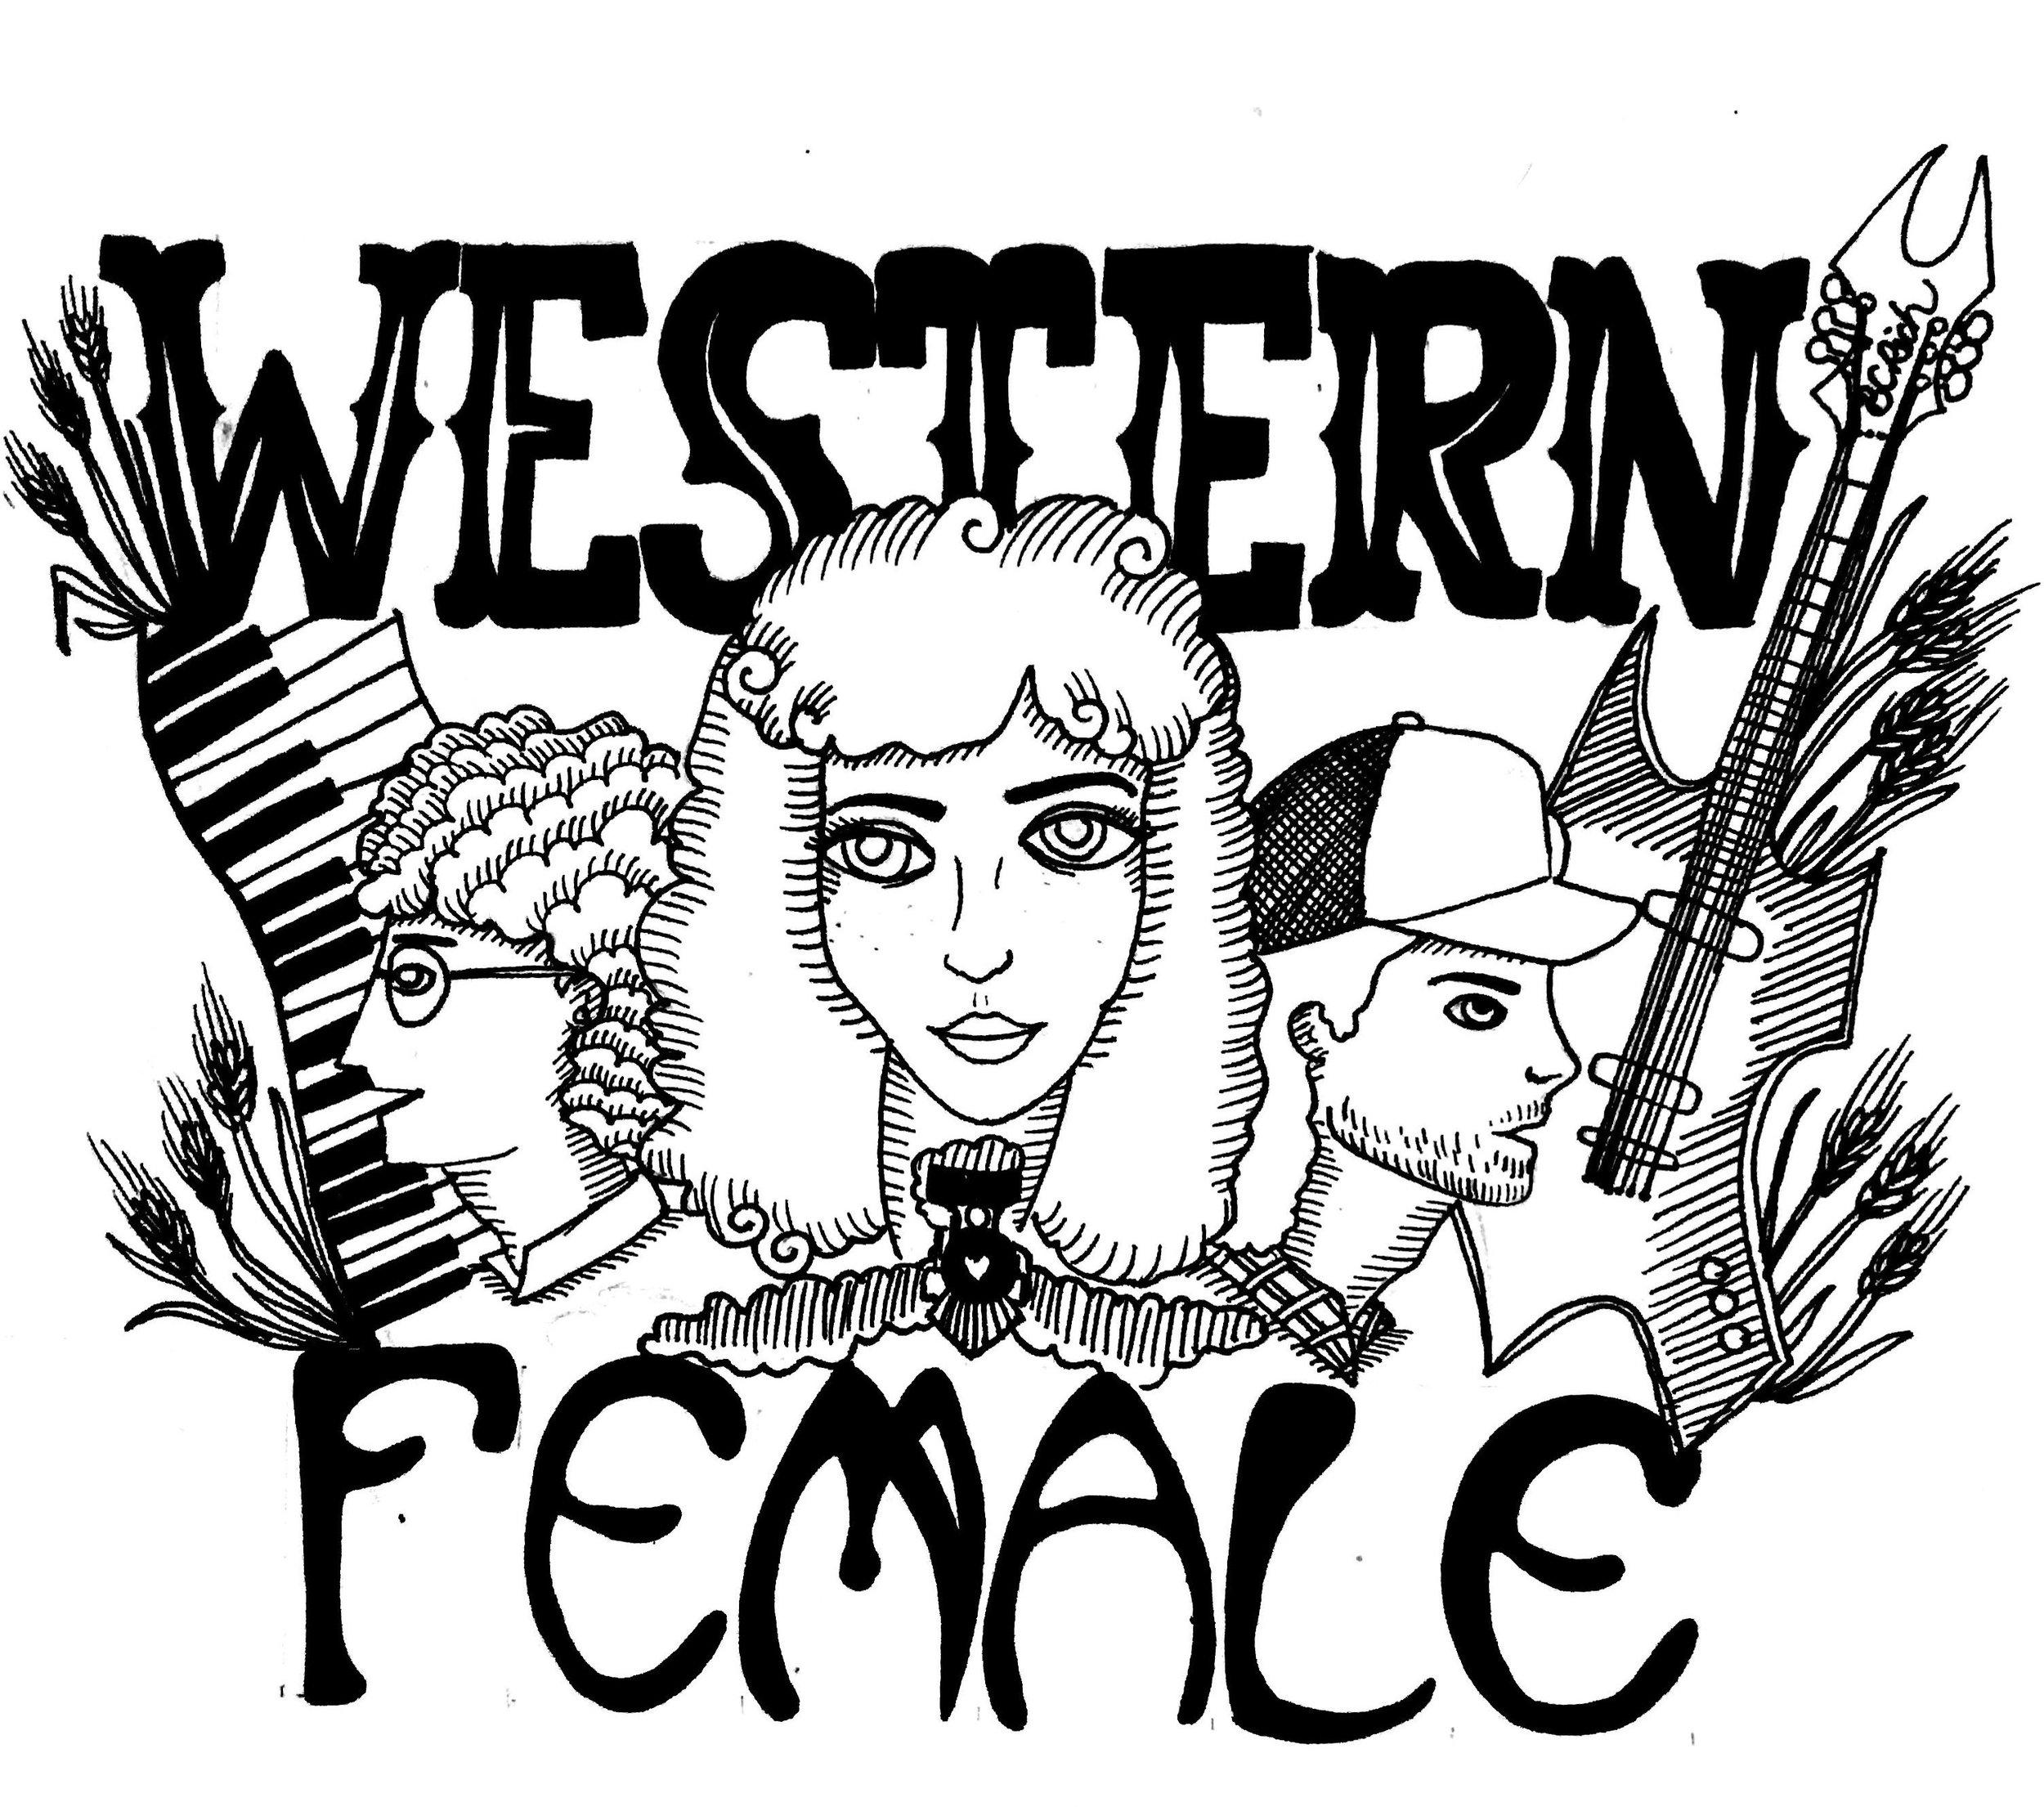 Western Female Sophia Tschida.jpg